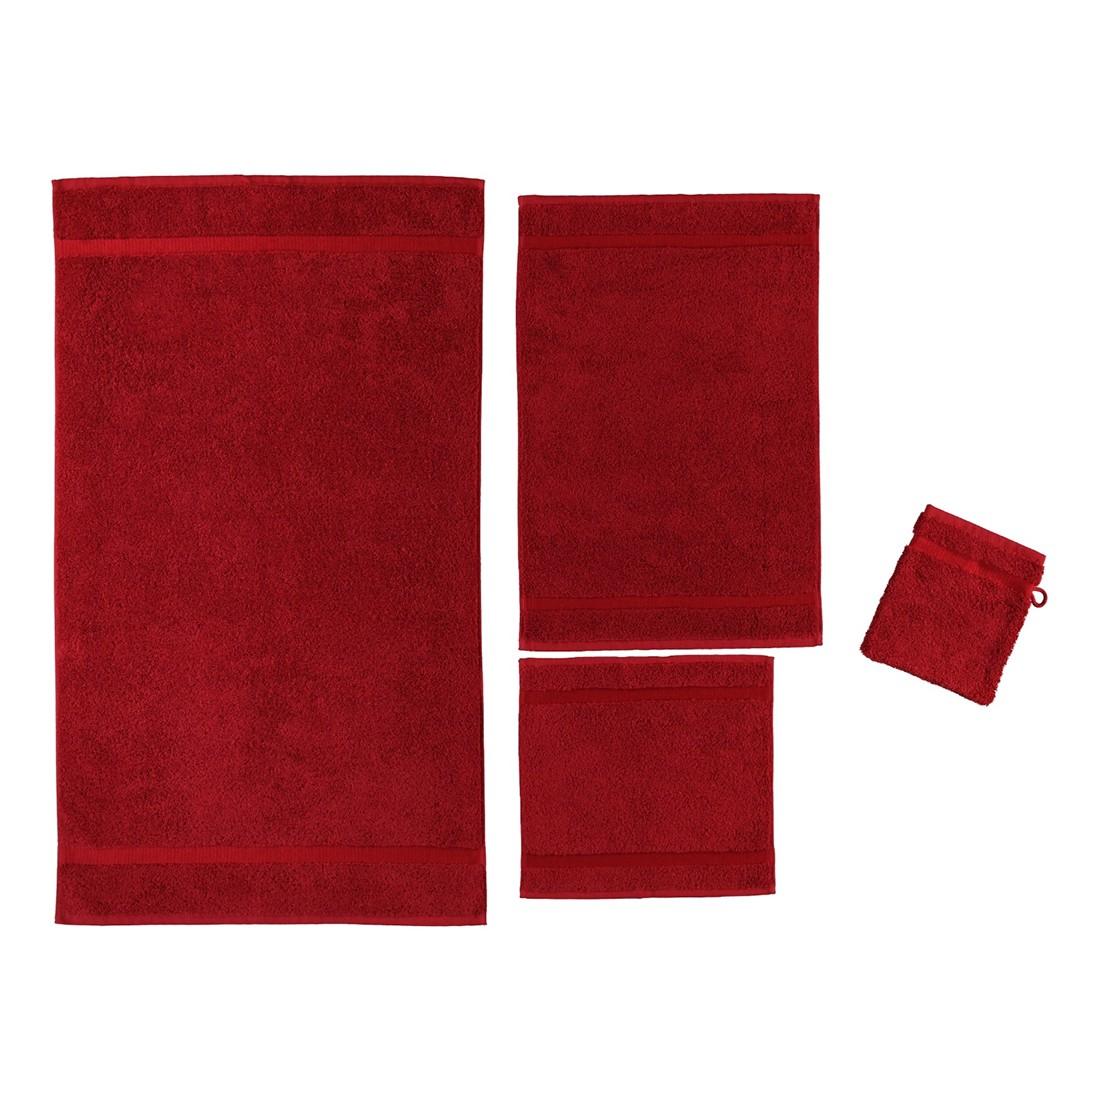 Handtuch Princess – 100% Baumwolle cardinal – 349 – Badetuch: 95×180 cm, Rhomtuft jetzt bestellen